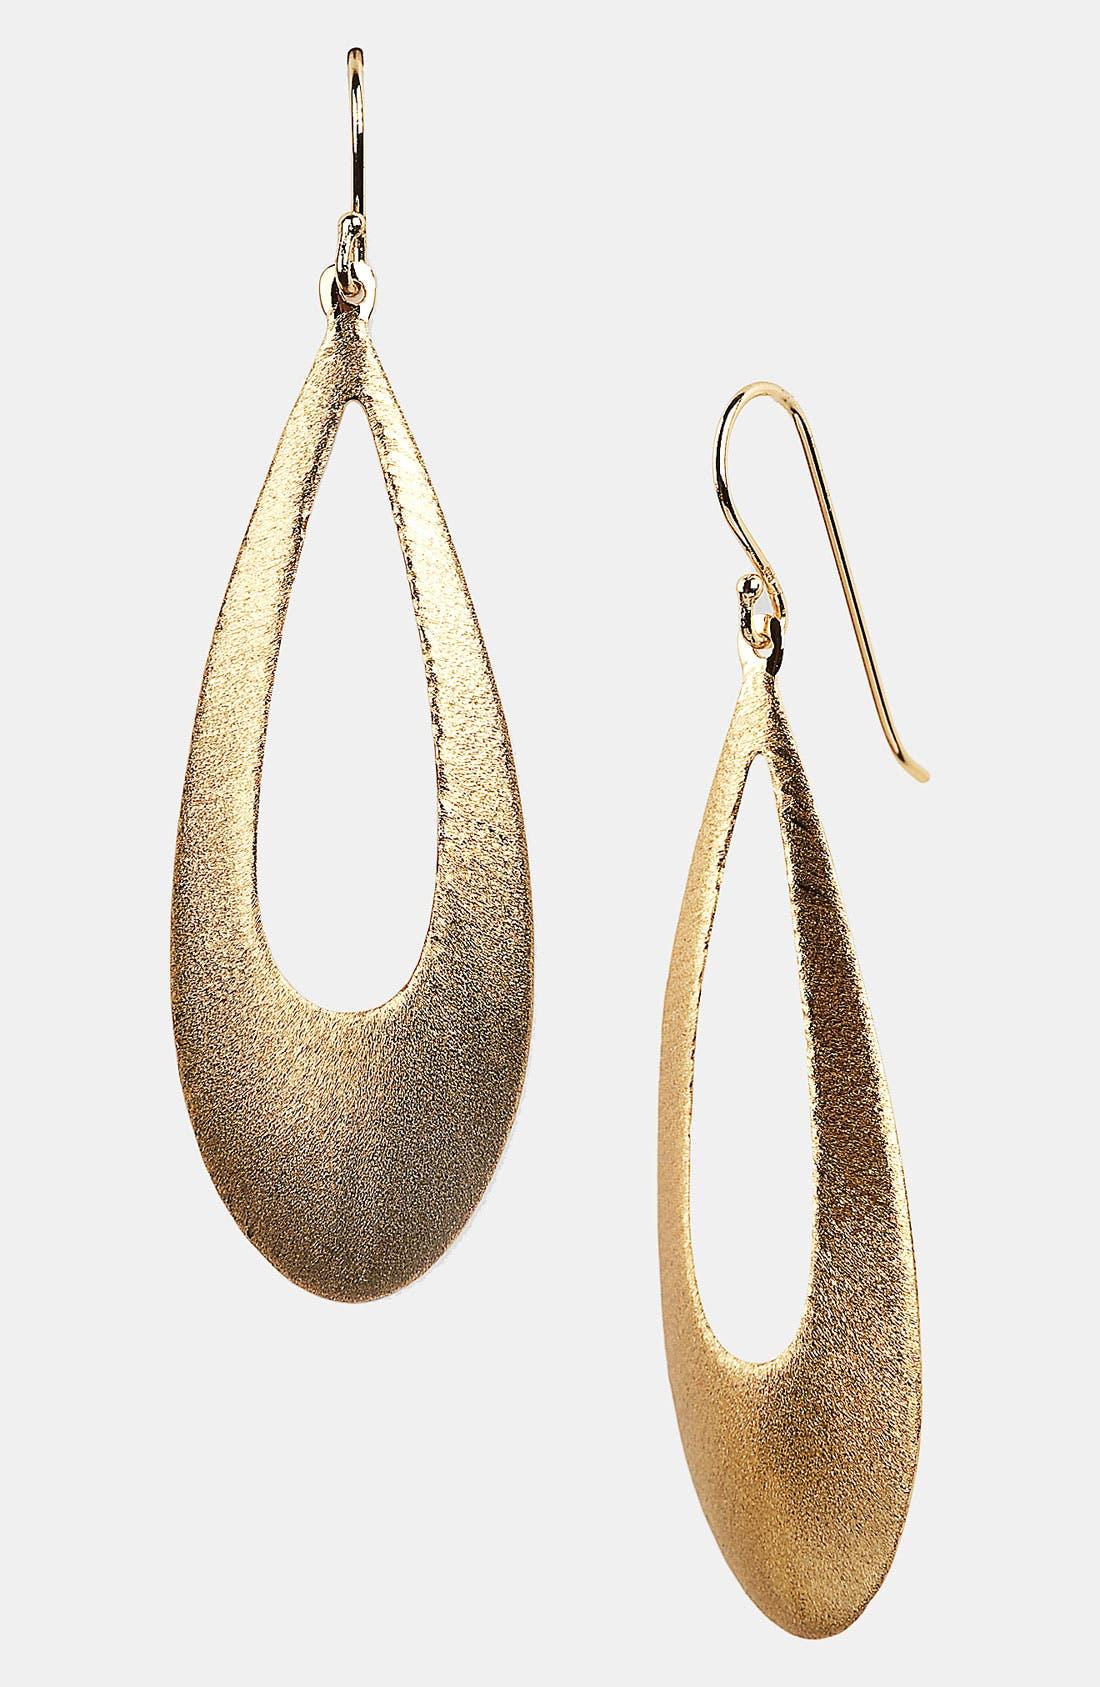 Alternate Image 1 Selected - Argento Vivo Open Teardrop Earrings (Nordstrom Exclusive)